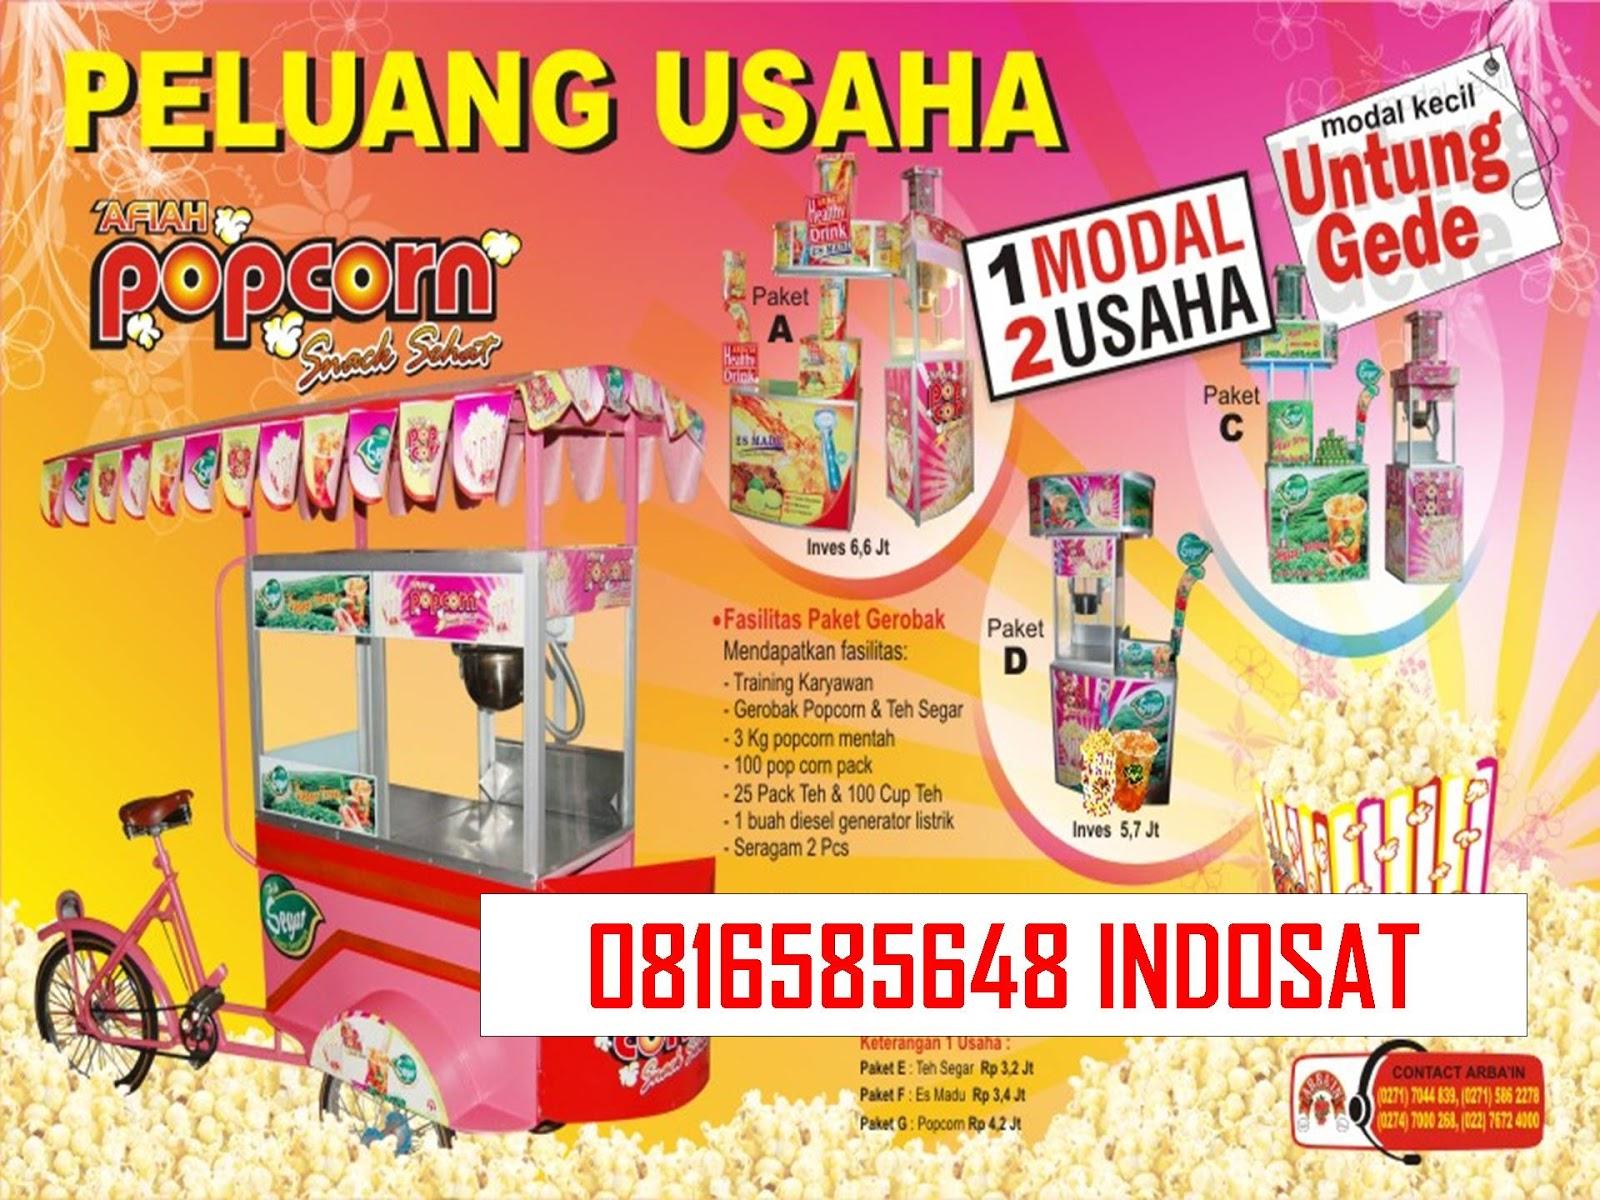 Peluang Usaha Modal Kecil Di Yogyakarta 0816 585 648 Indosat